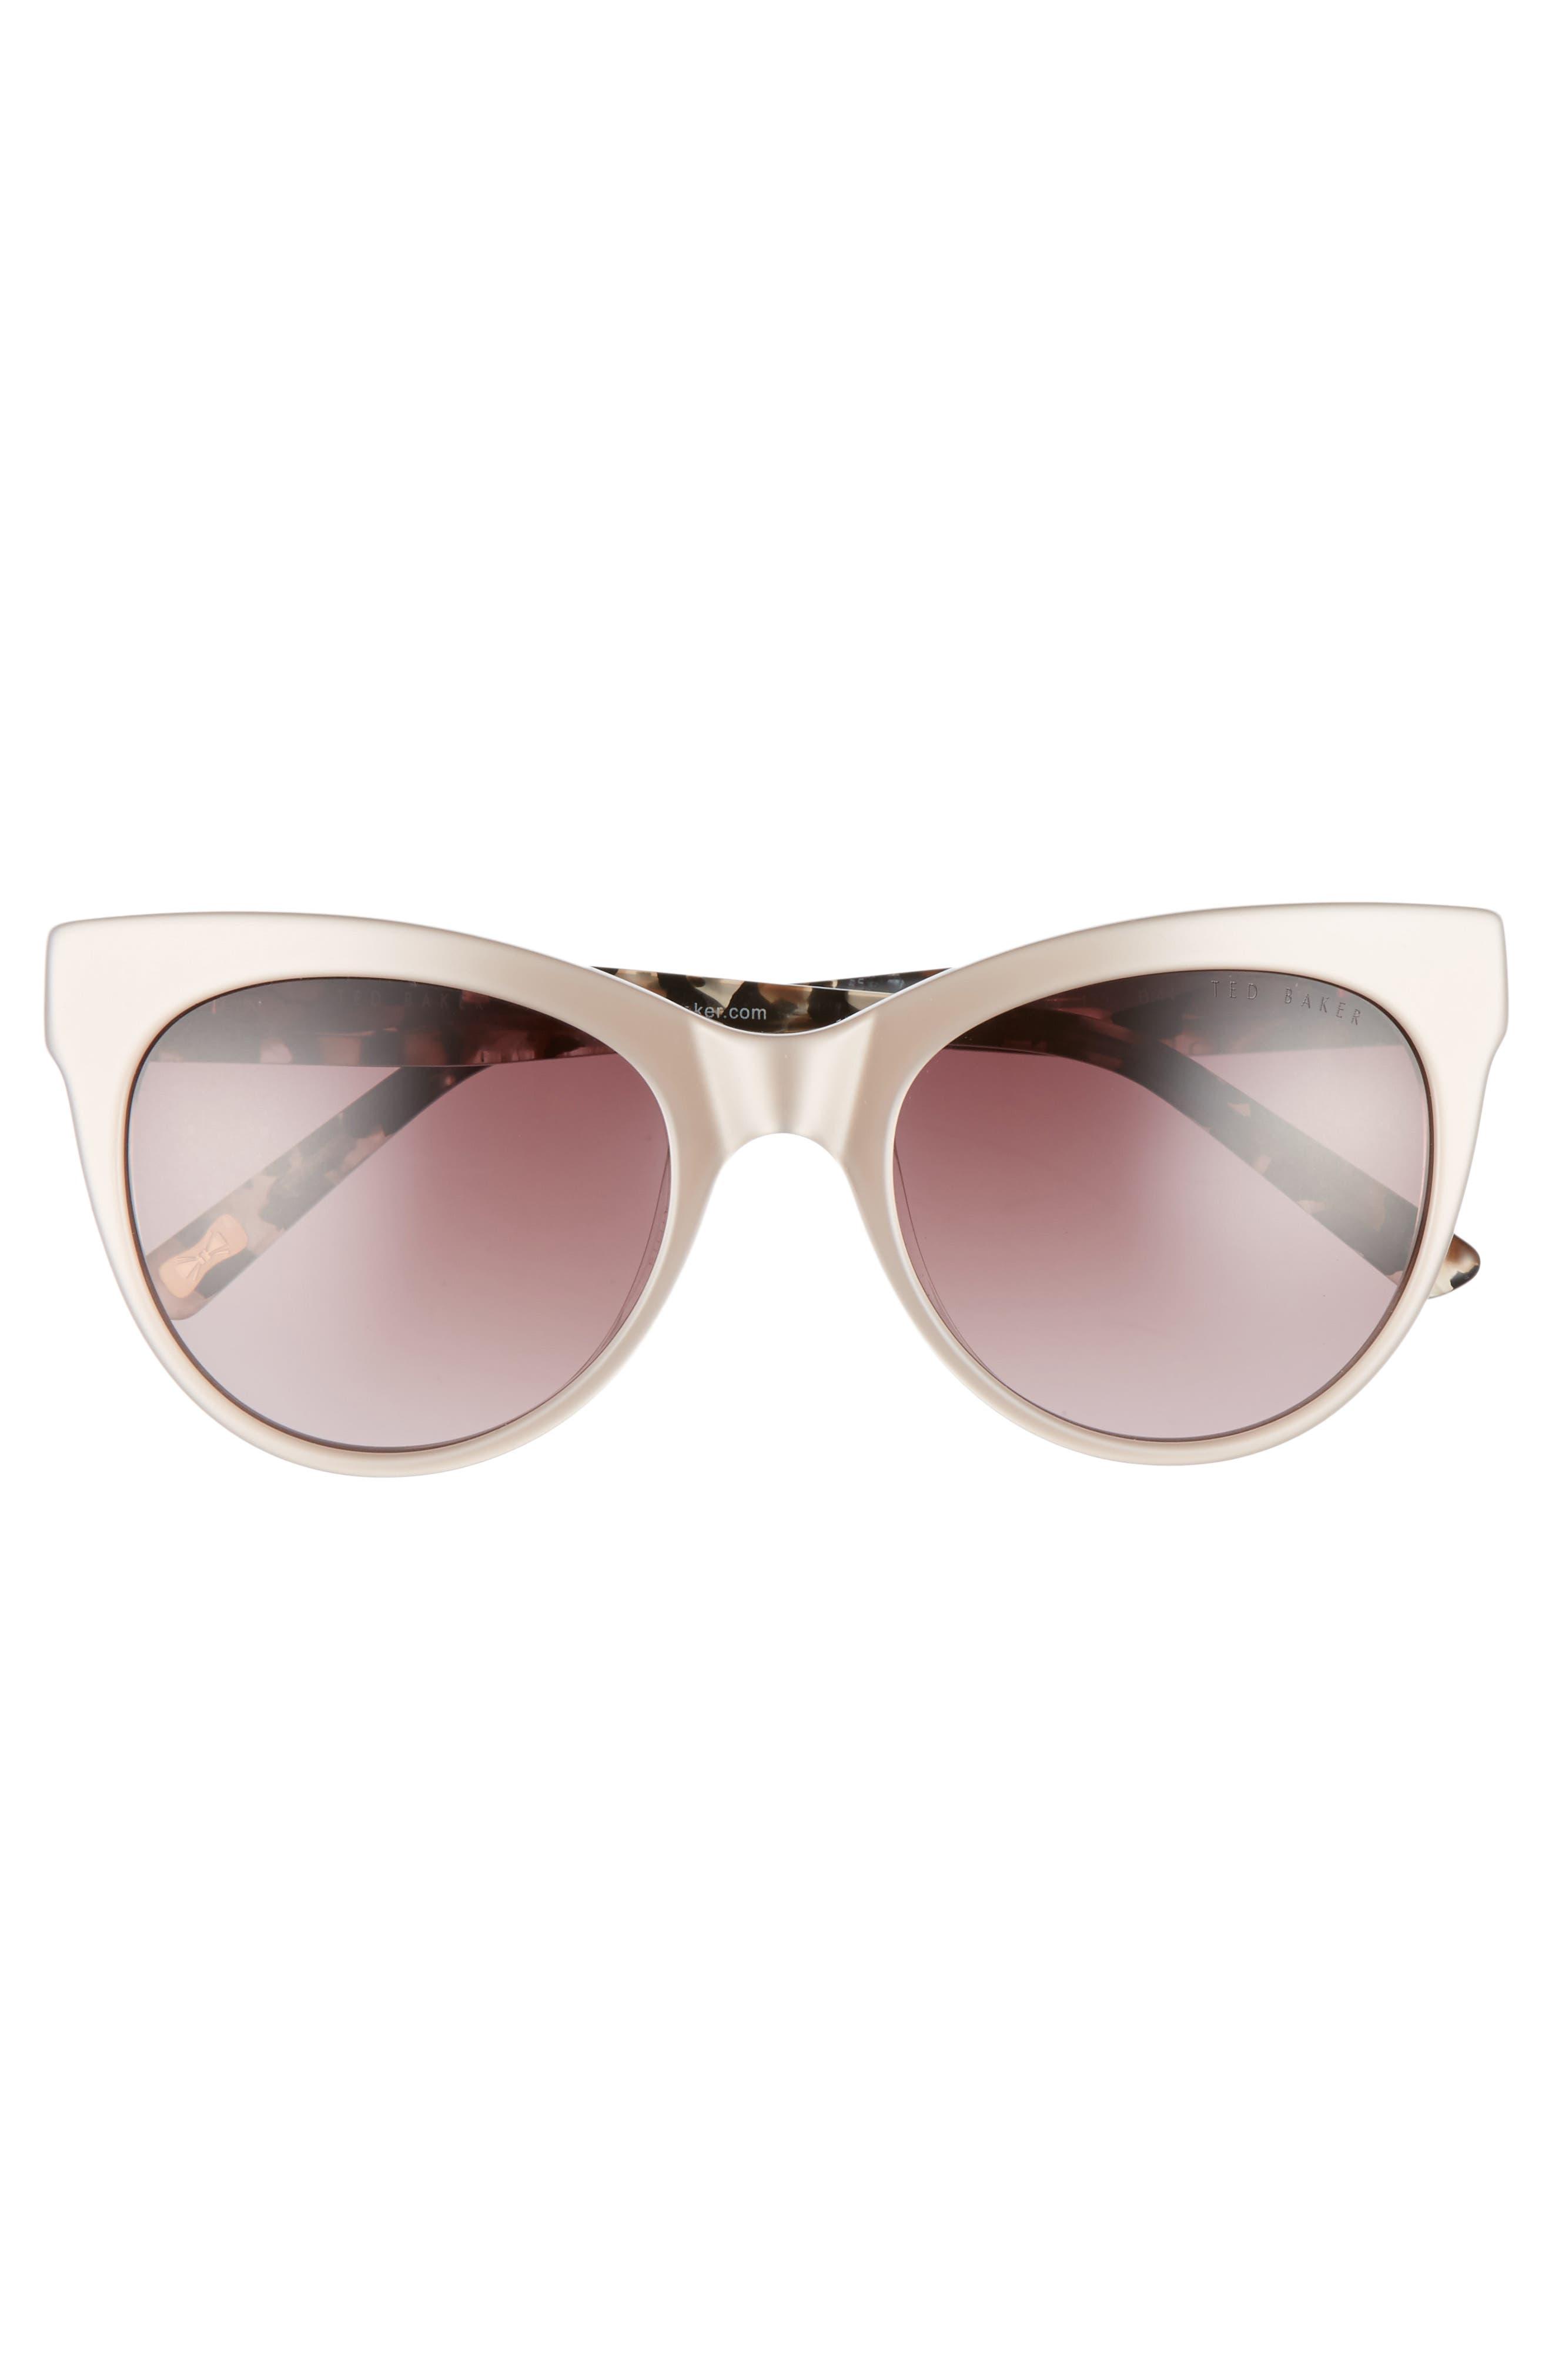 51mm Cat Eye Sunglasses,                             Alternate thumbnail 5, color,